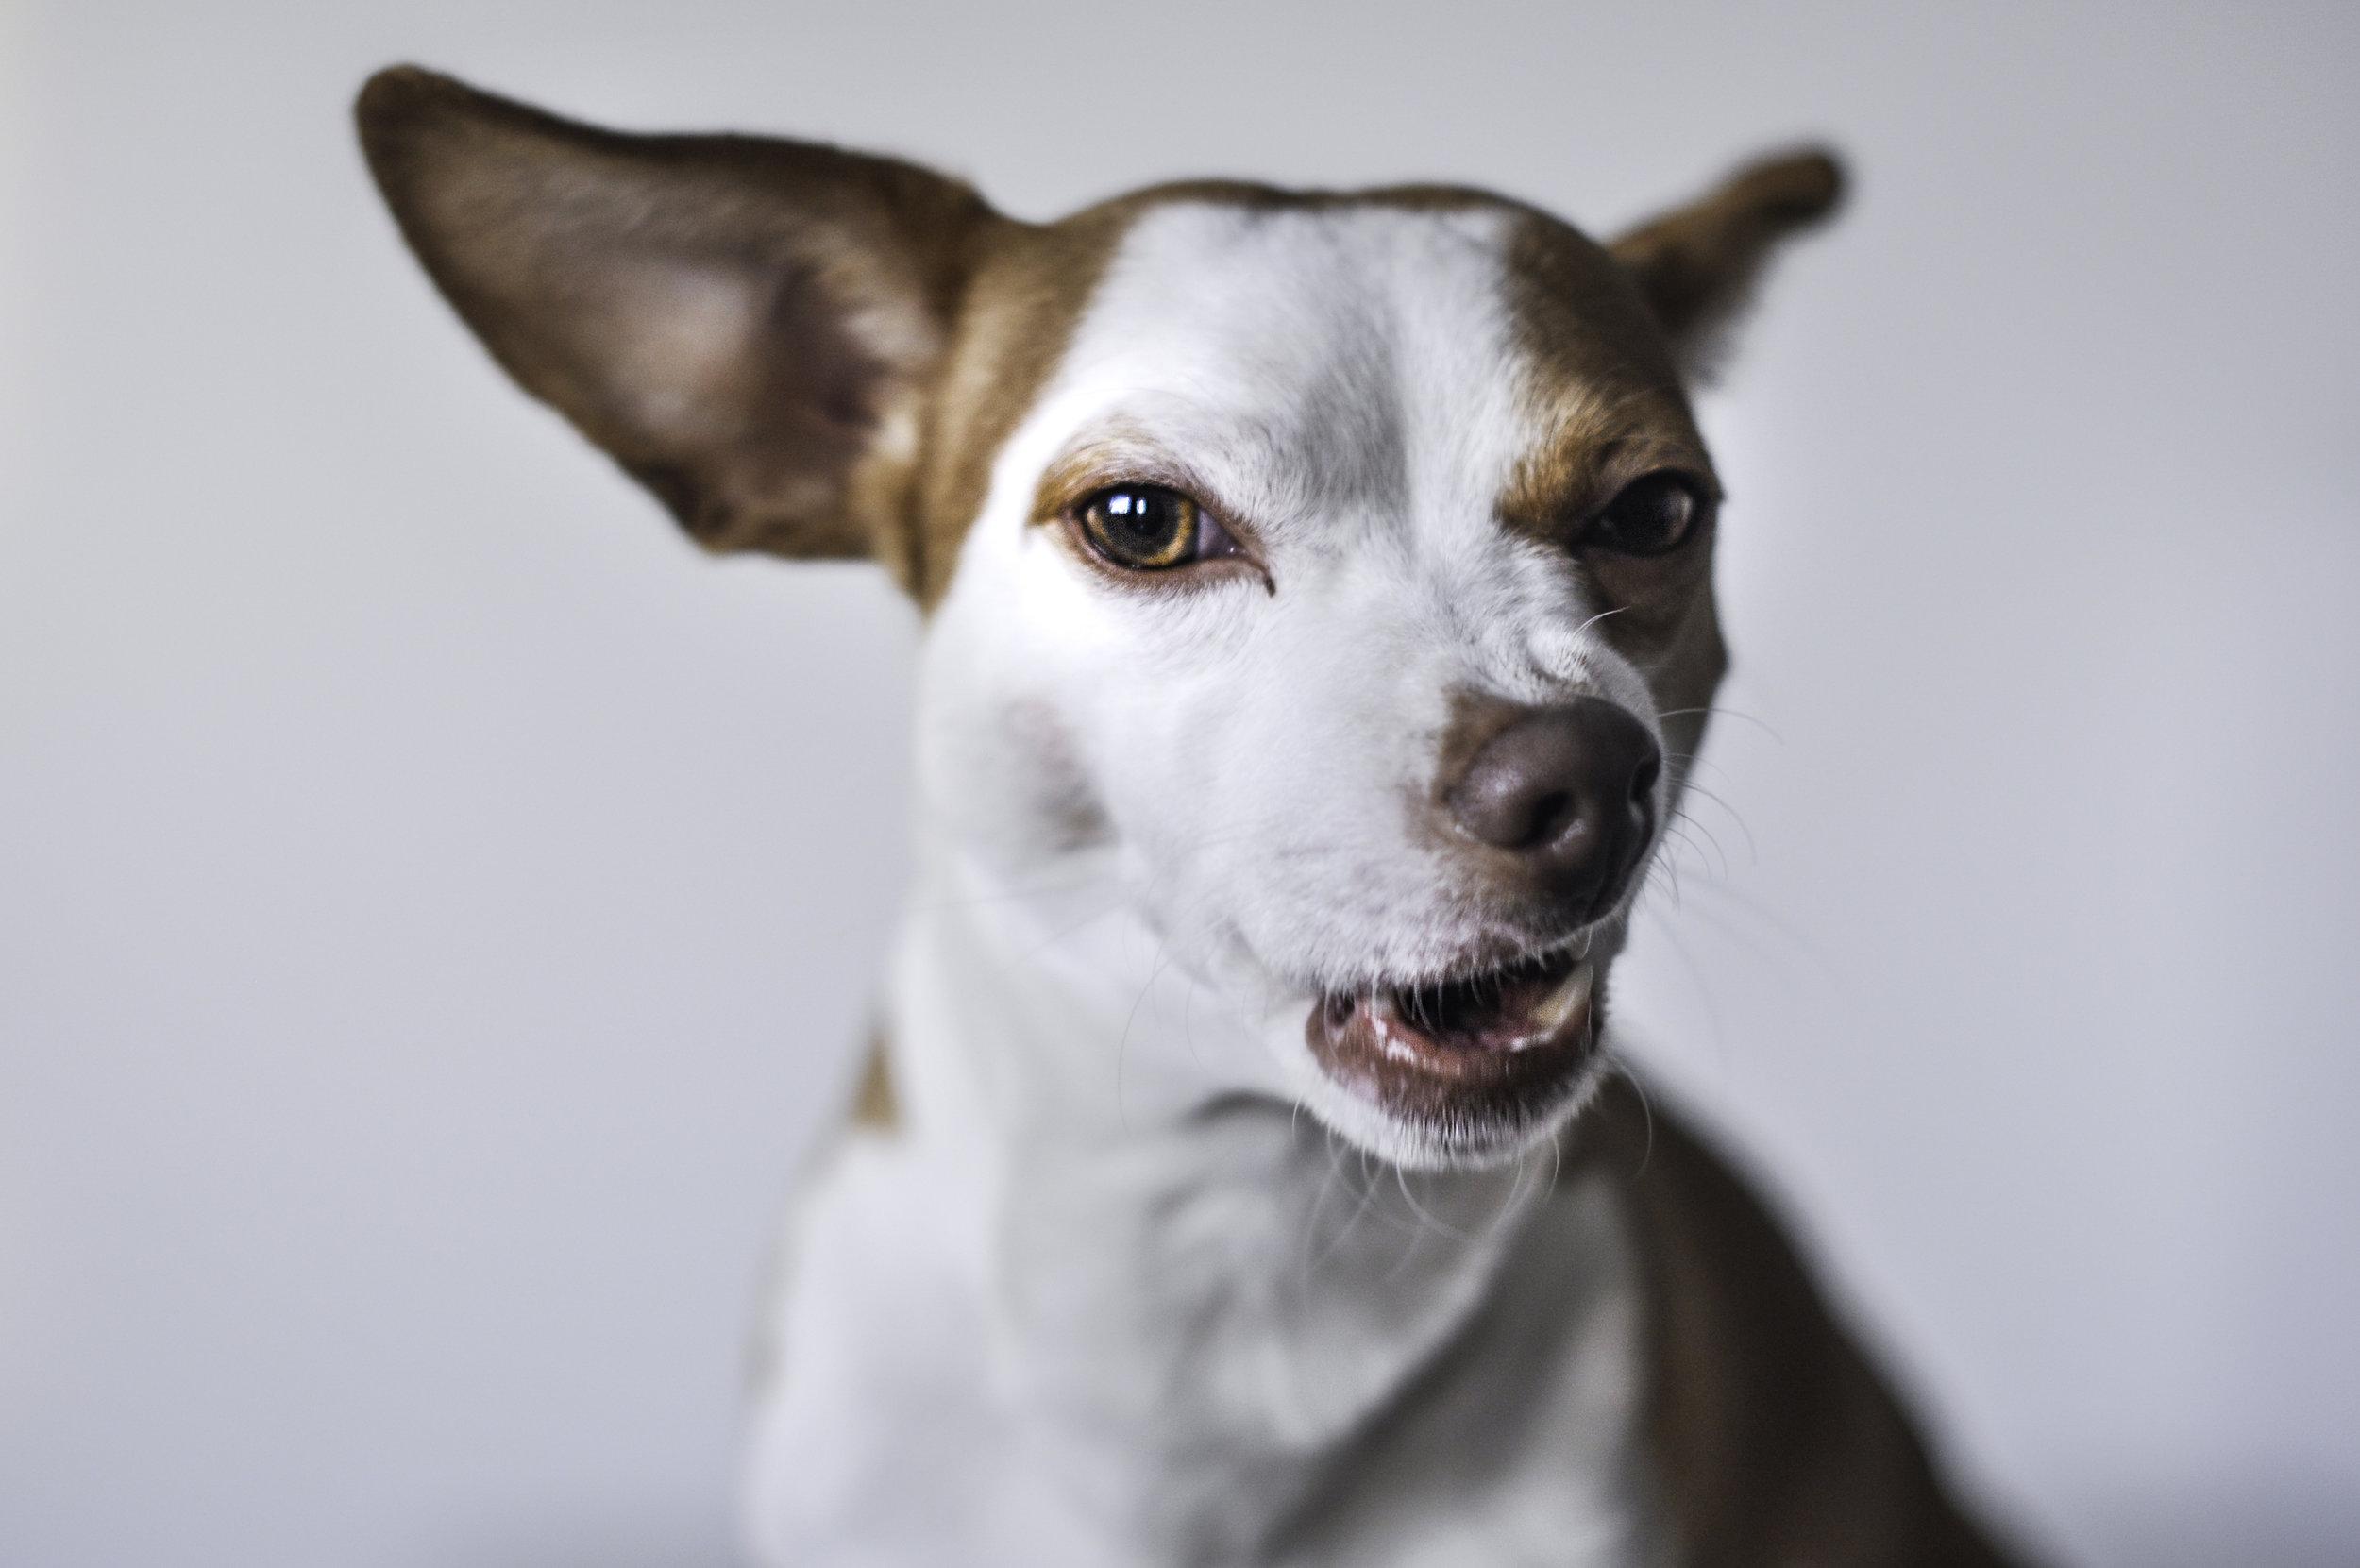 behavior - No Bad Attitudes Here. Happy Dog = Happy Life!